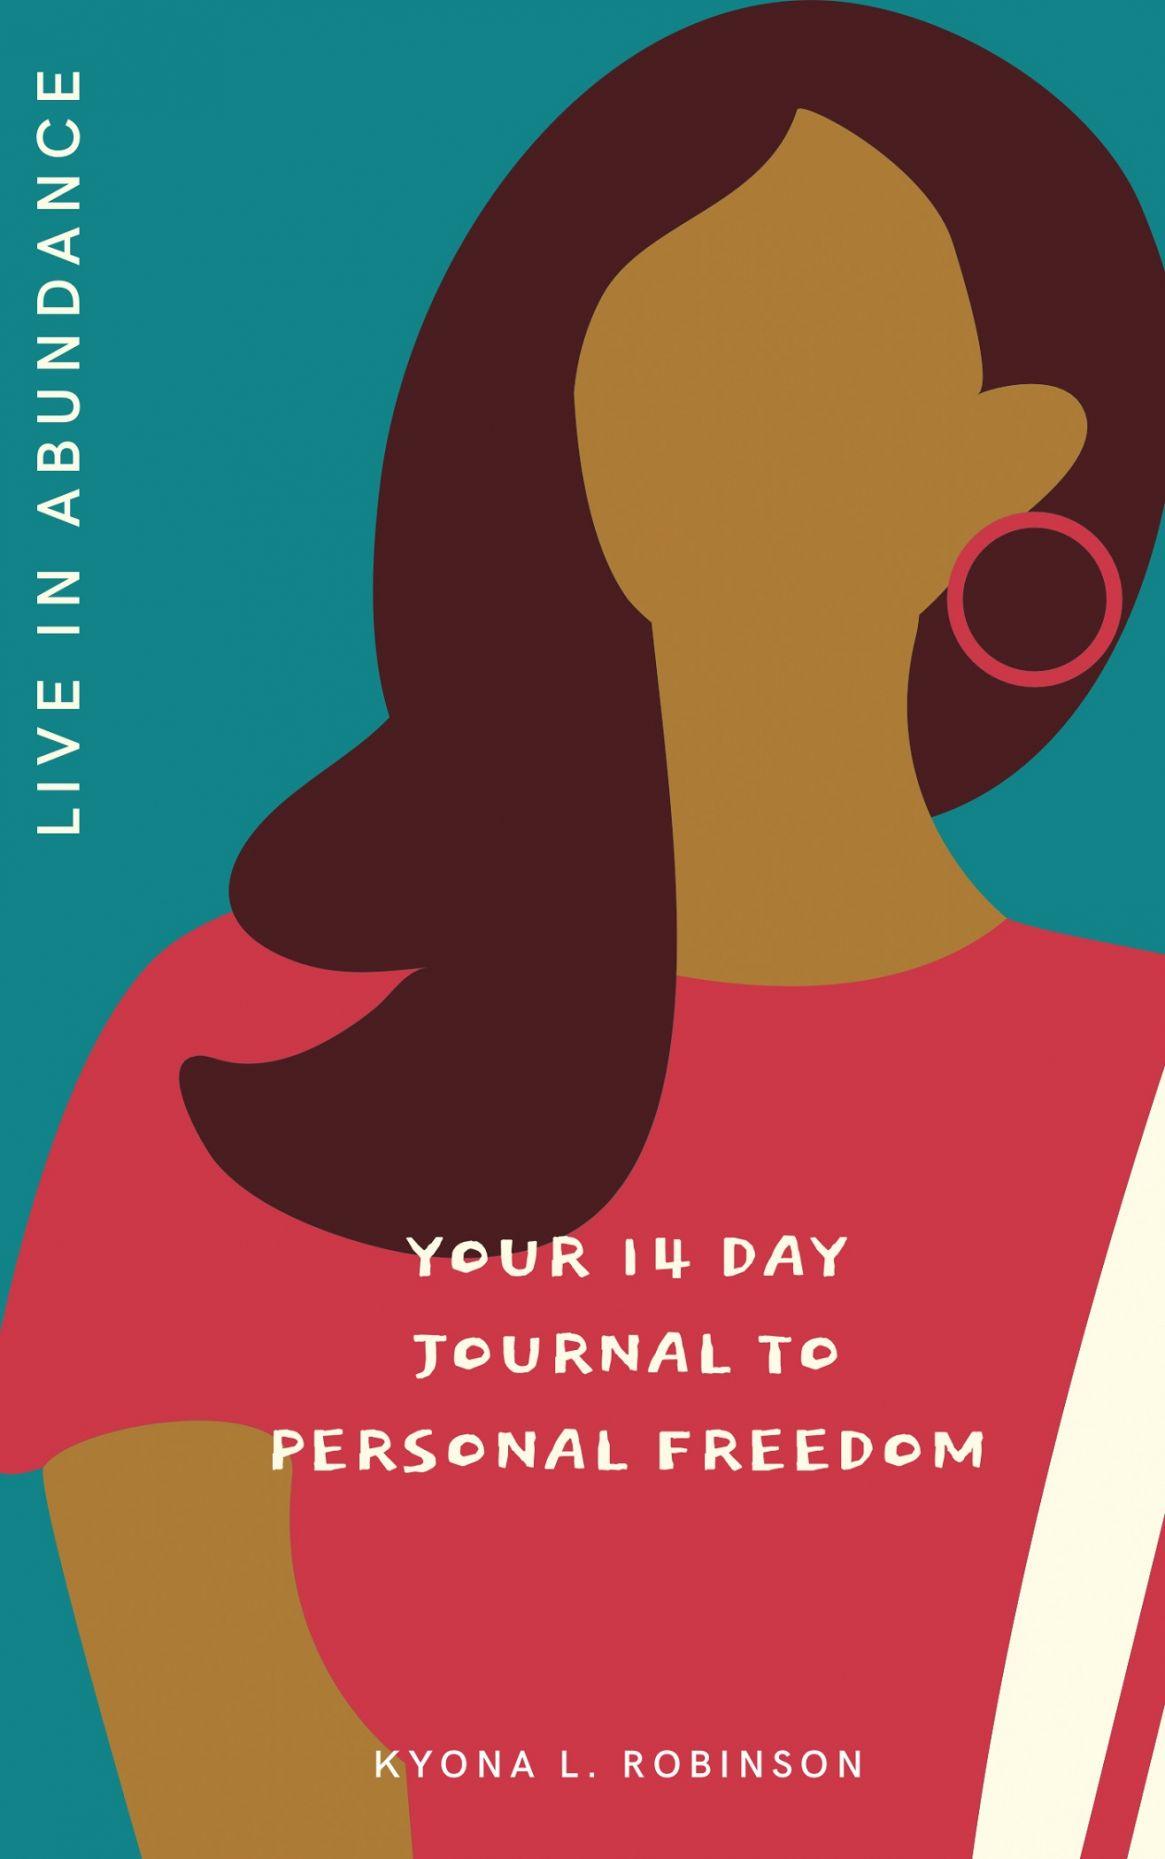 'Live In Abundance' by Kyona L. Robinson